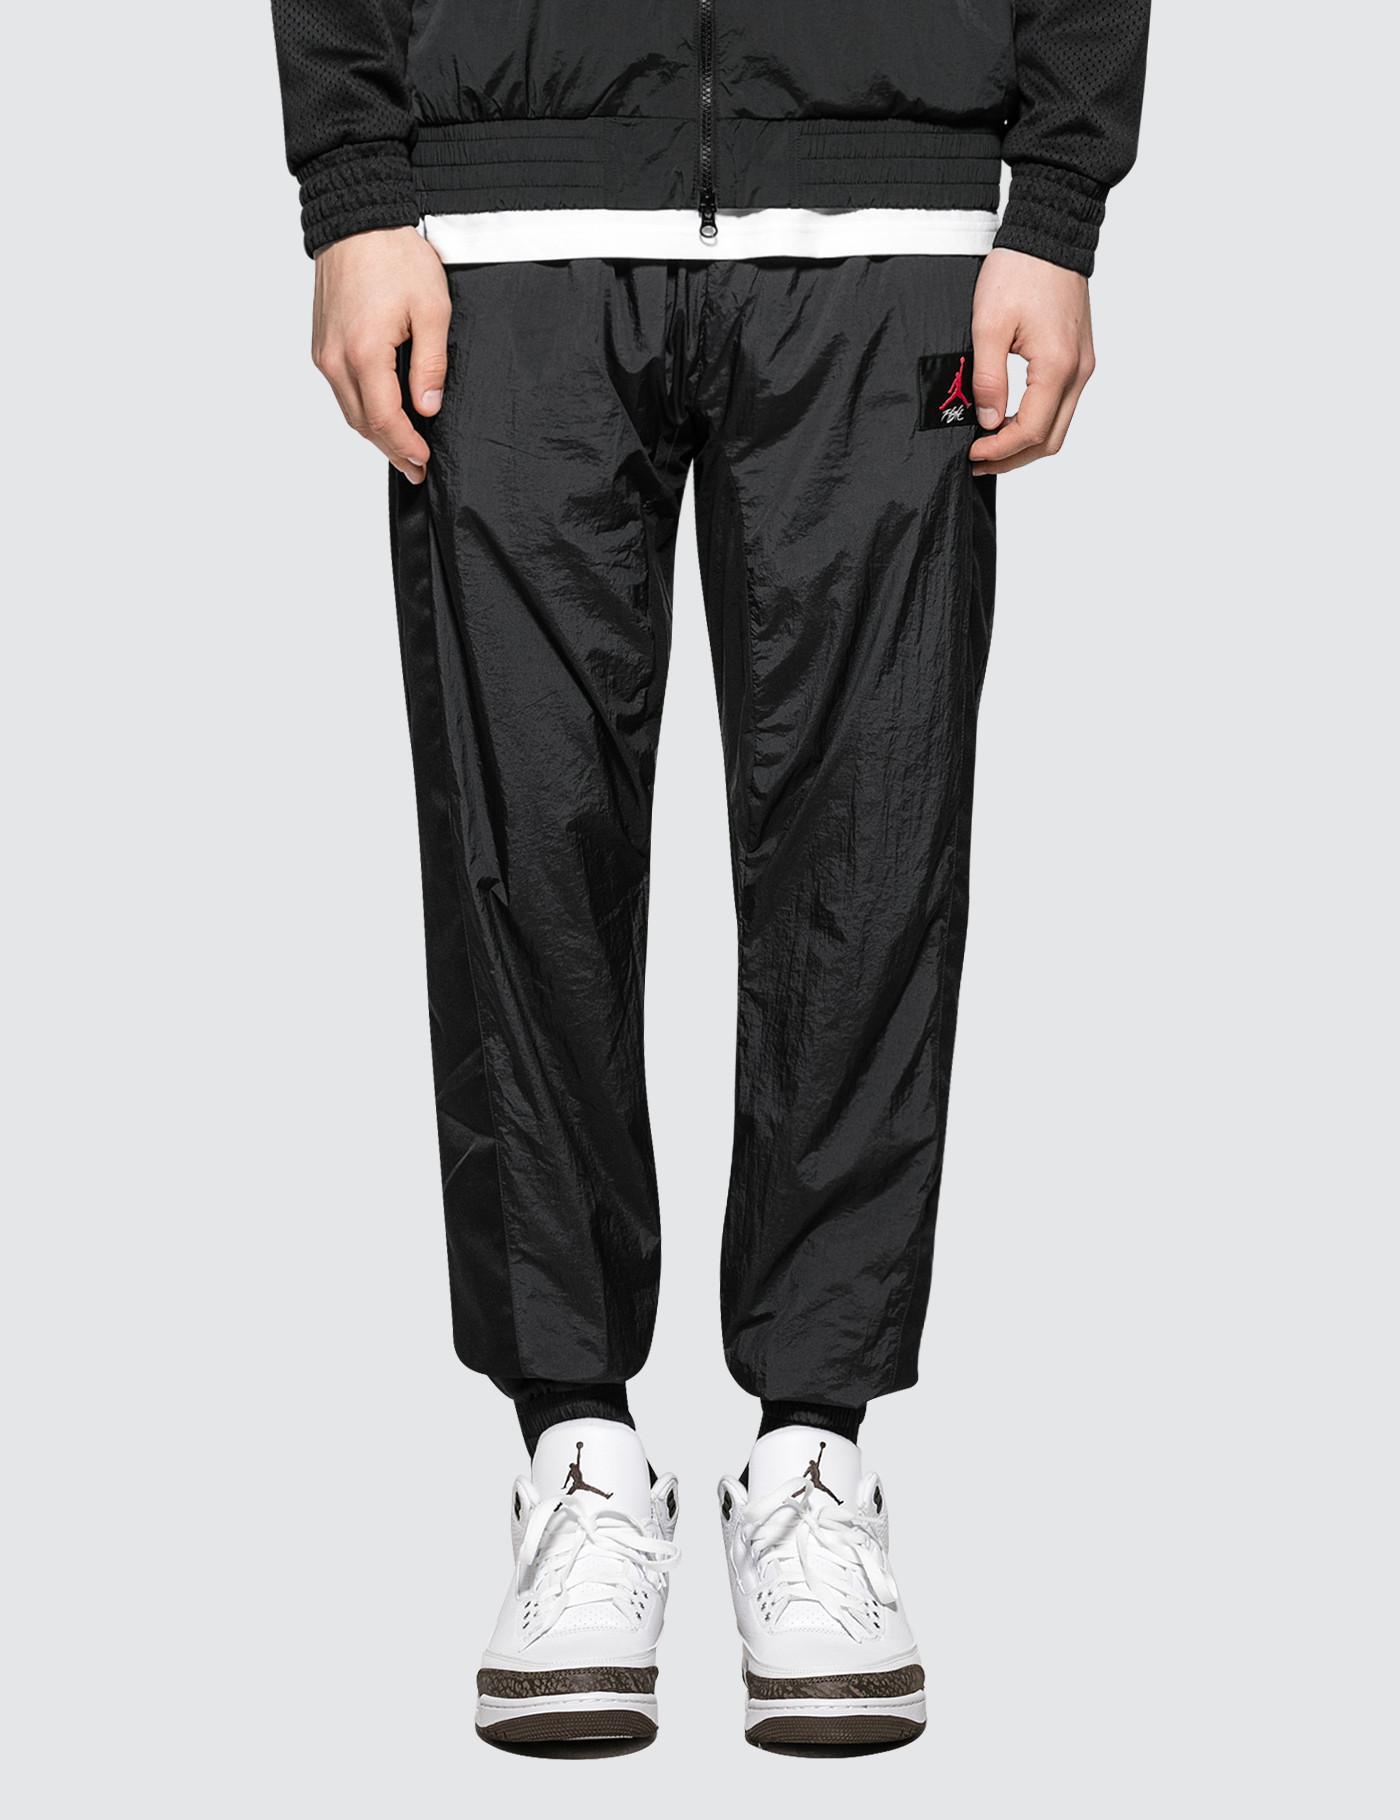 new arrival b10e2 015fc Nike. Men s Black As Flight Warm-up Pants